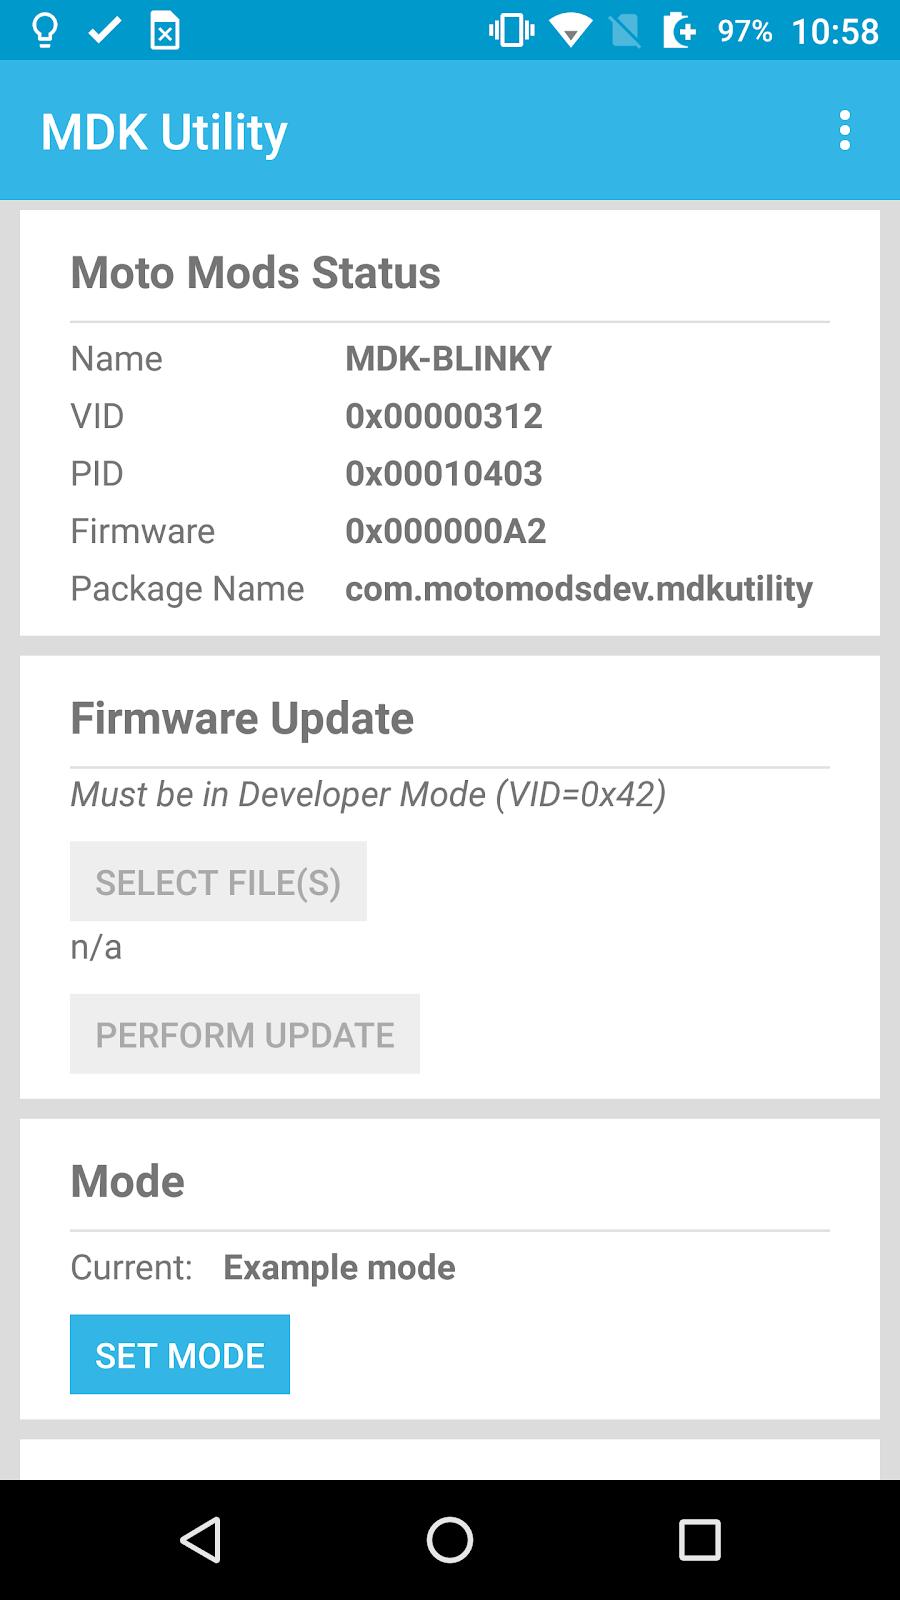 Moto Mods Developer Part 5 - Flashing Firmware     | element14